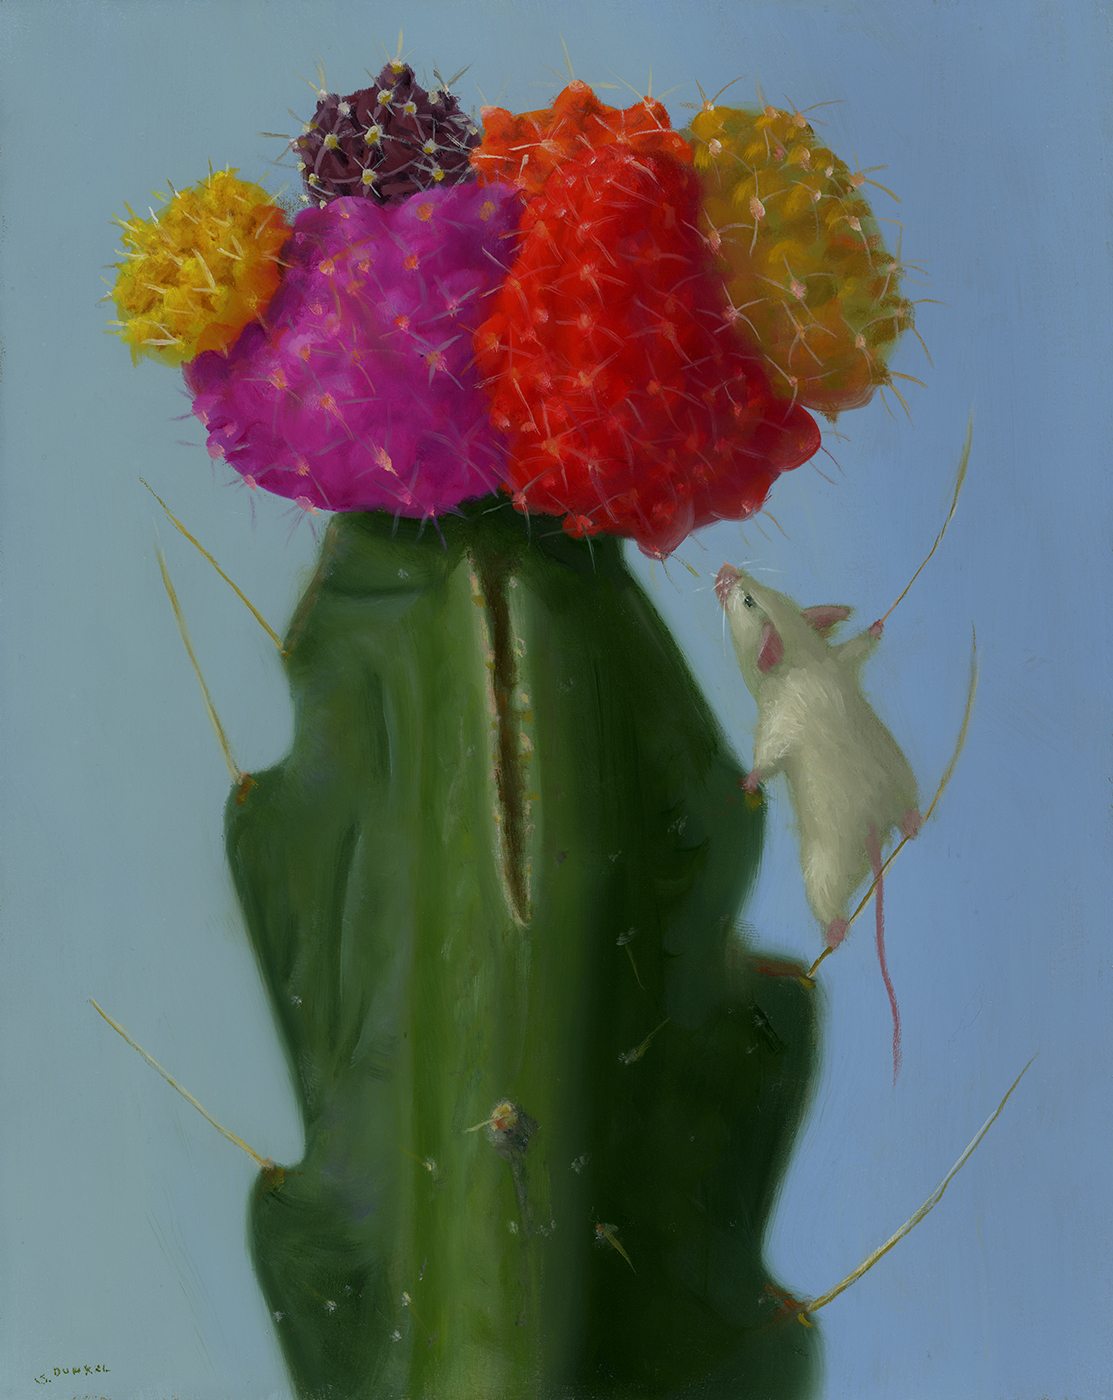 stuart_dunkel_sd1211_cactus_climber.jpg